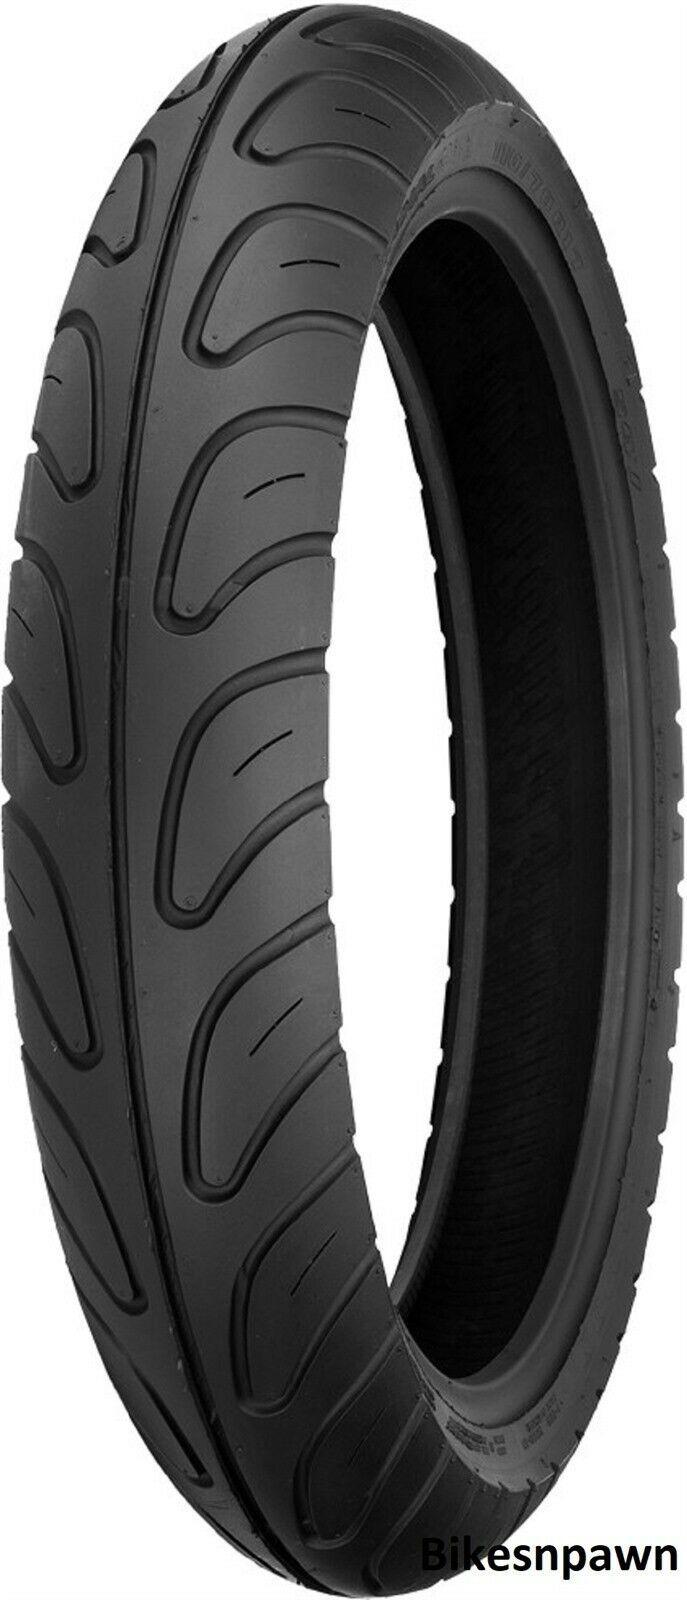 New Shinko 006 Podium Radial 110/70R17 Front Motorcycle Performance Tire 54V